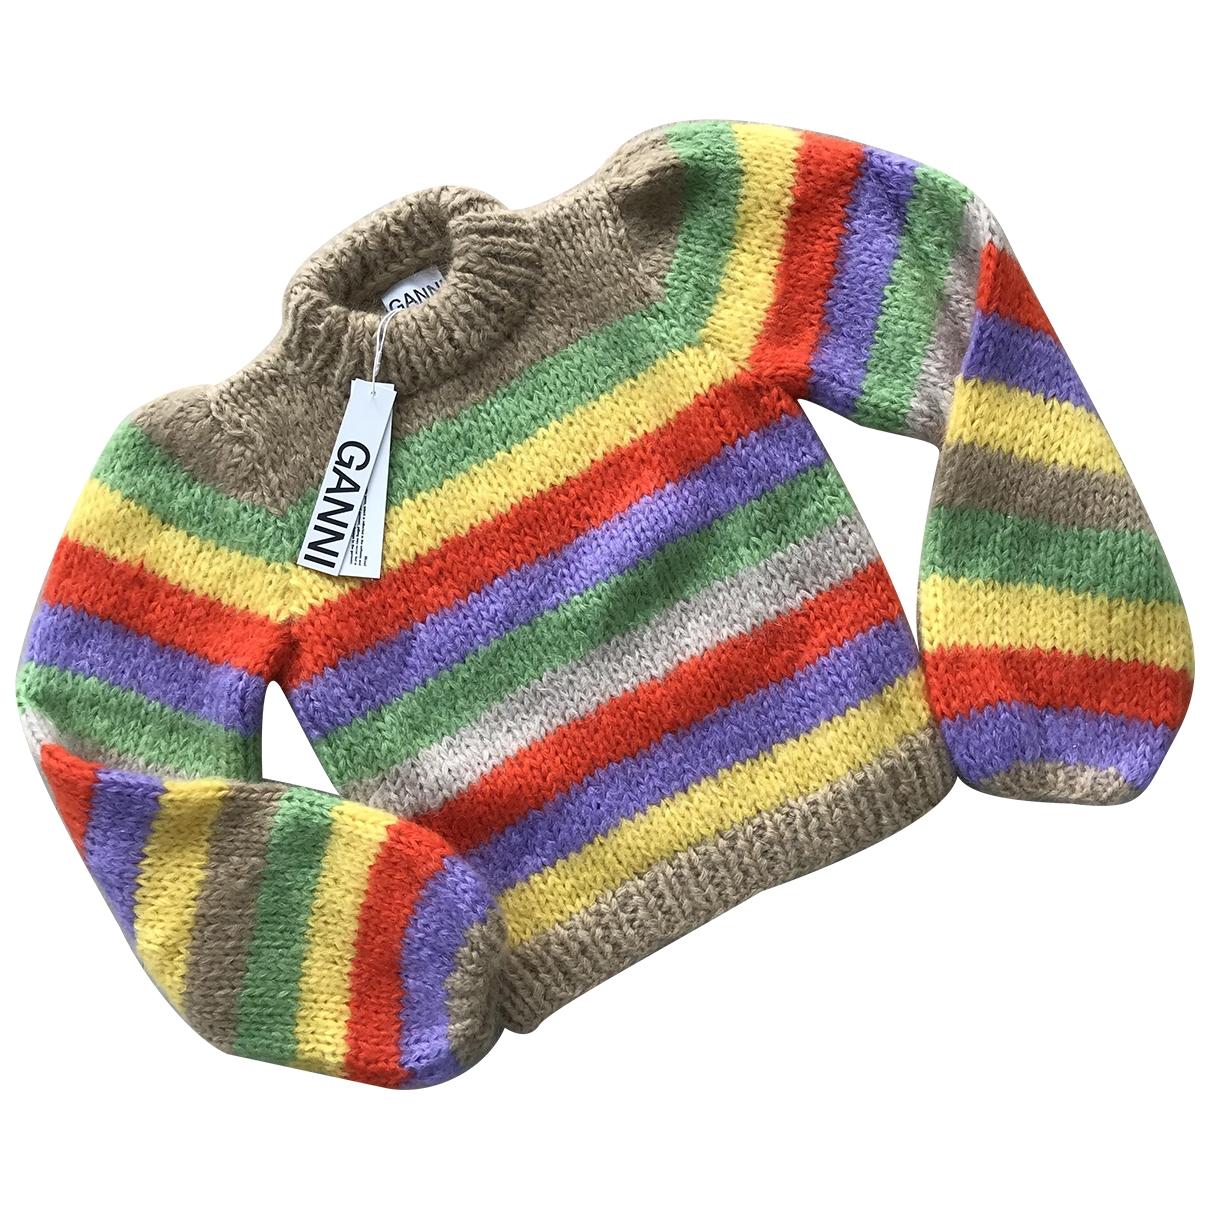 Ganni Spring Summer 2020 Pullover in  Bunt Wolle